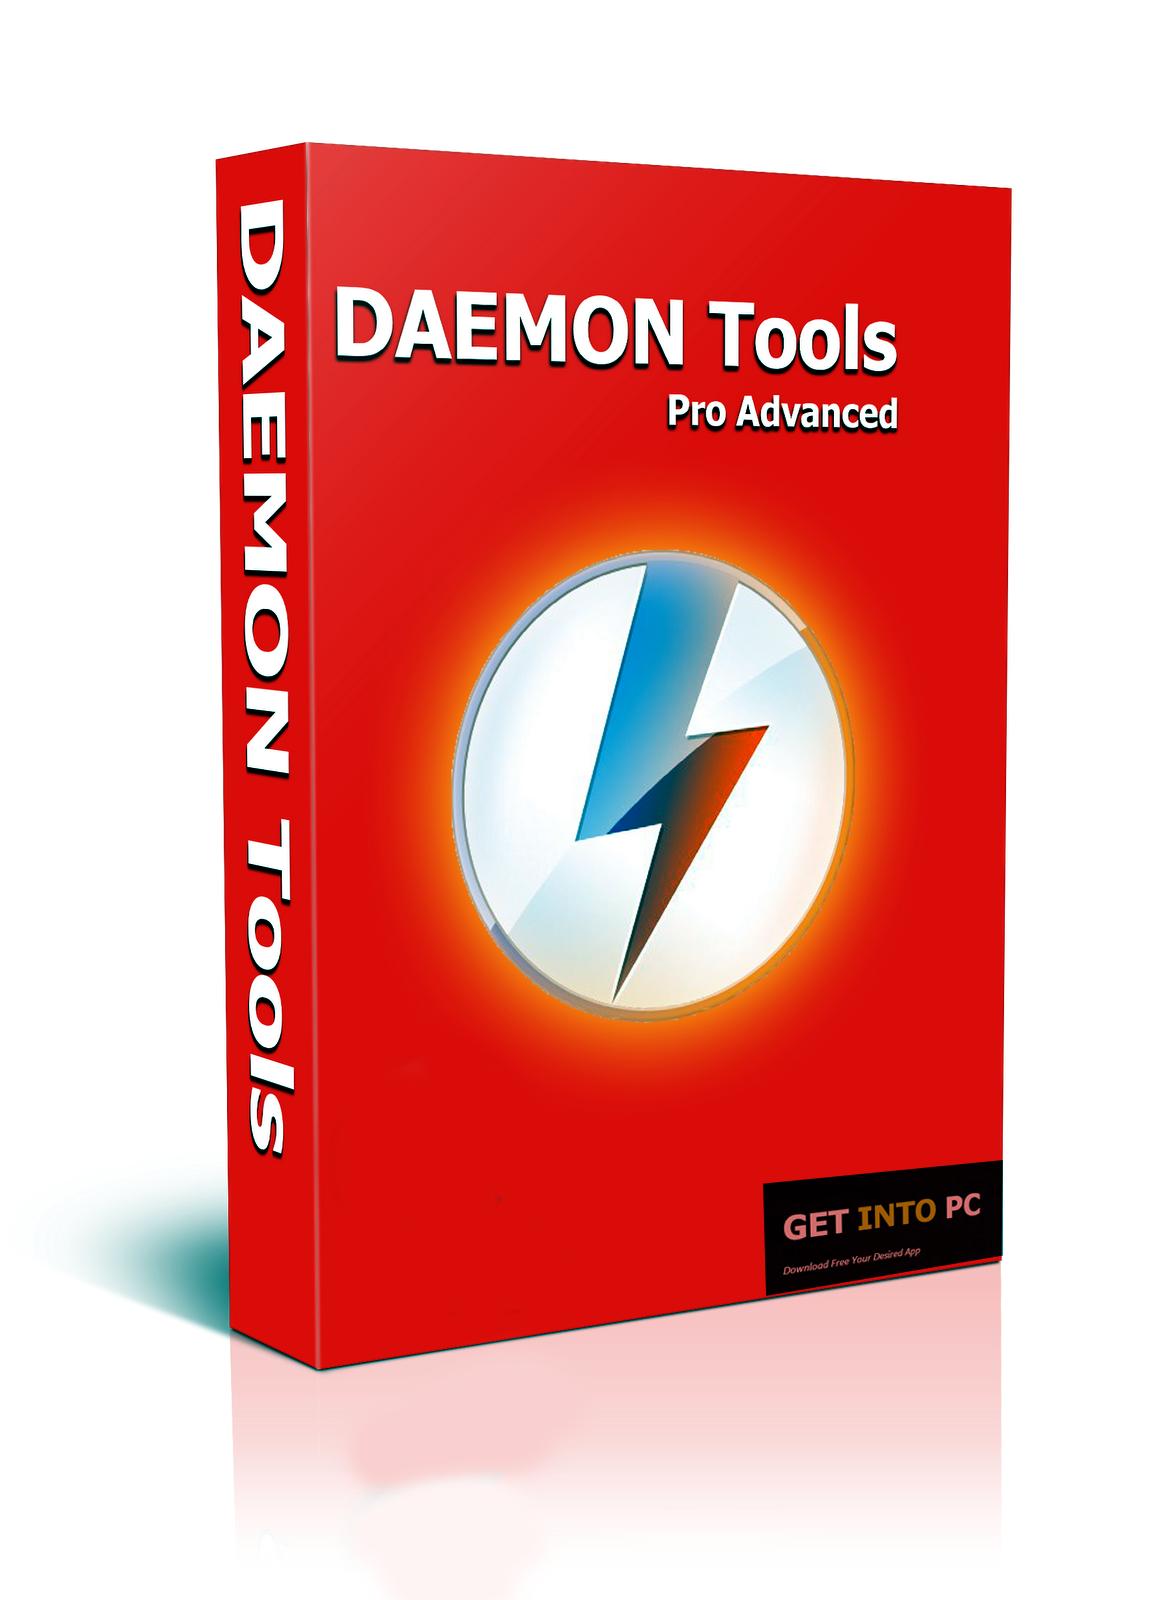 DAEMON Tools Crack Pro 8.3.0.0767 + Keygen Free [Latest]